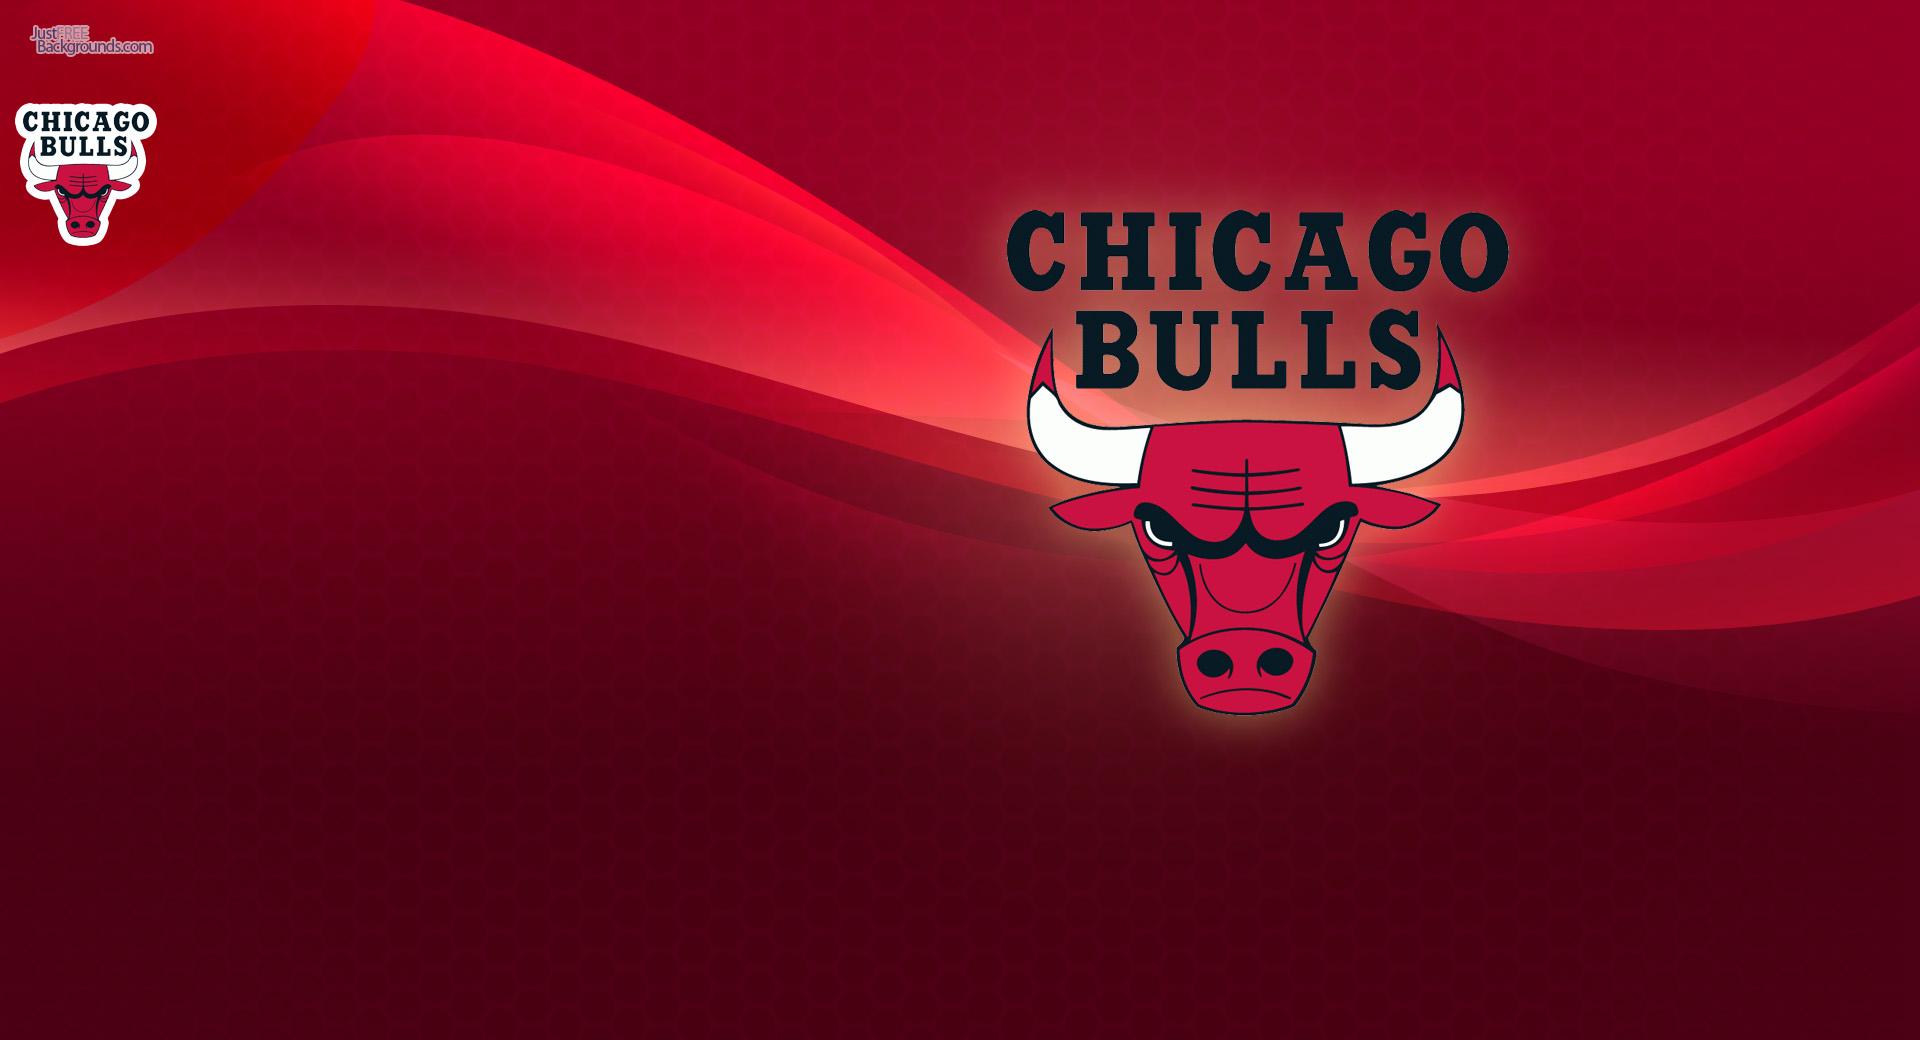 Chicago Bulls Wallpaper Beautiful K9N is HD wallpaper This 1920x1040